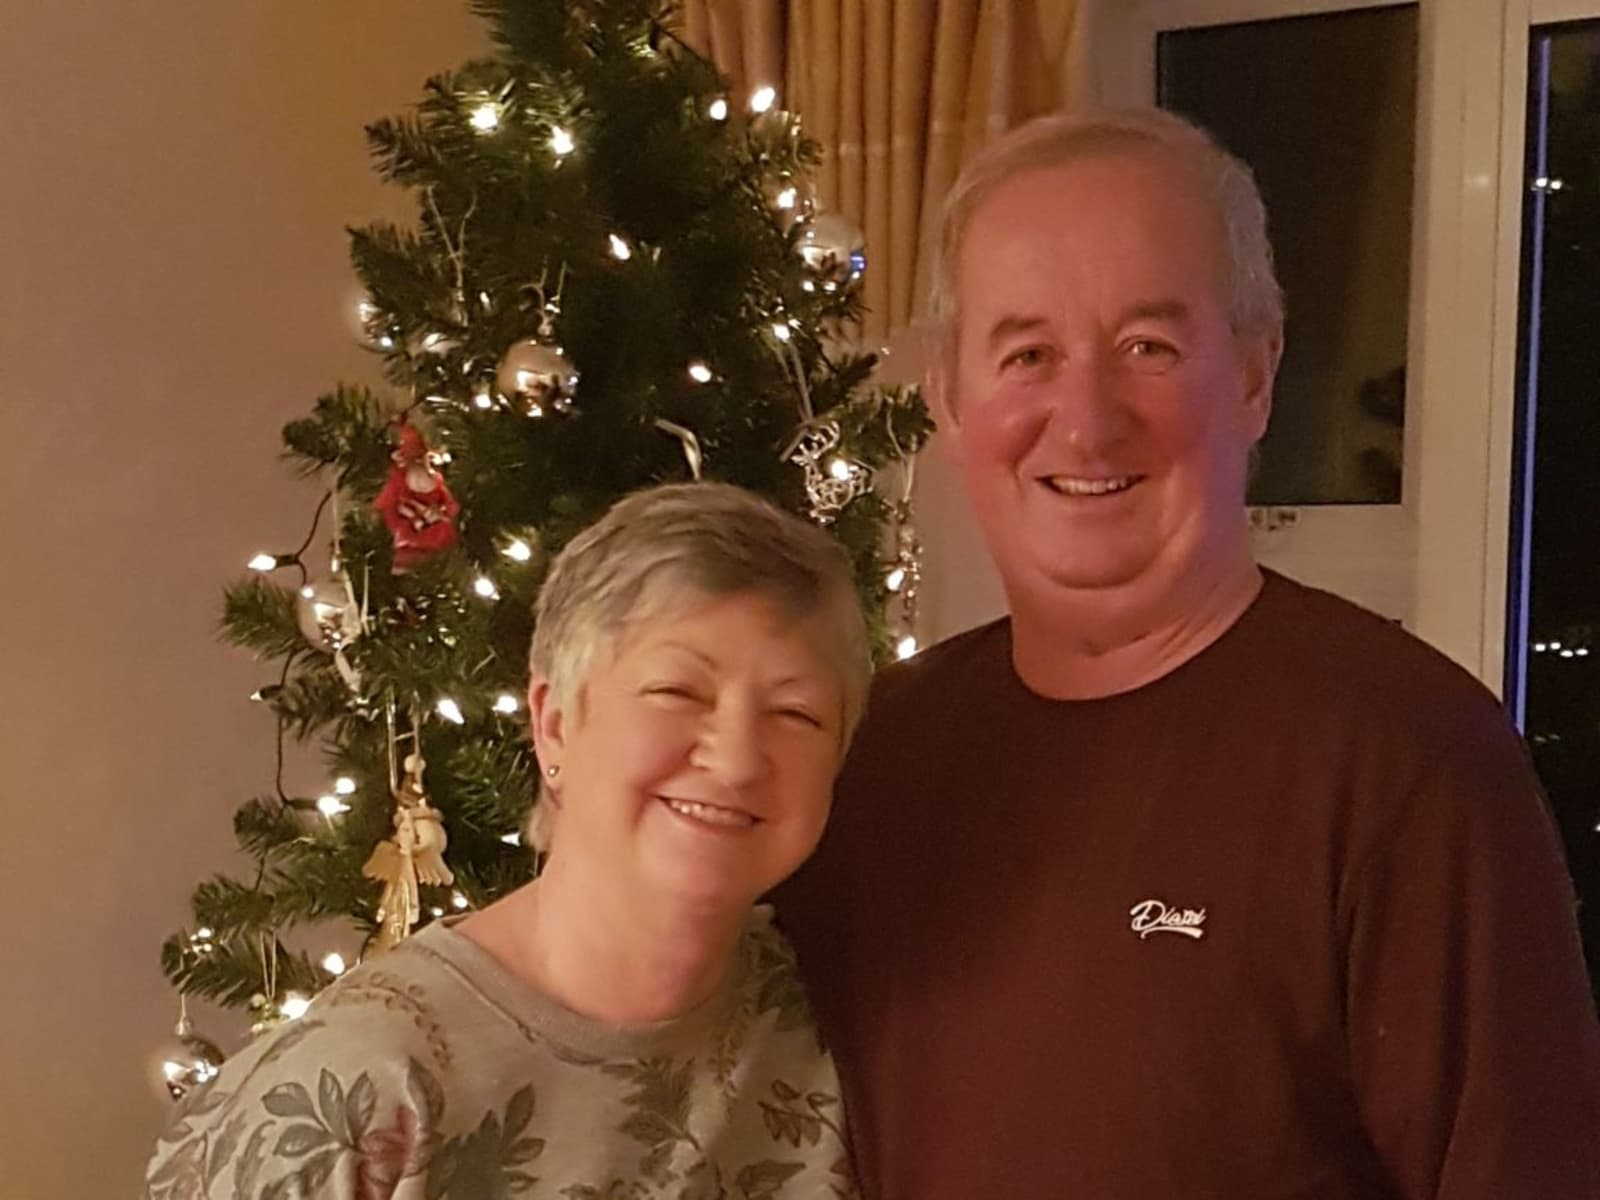 Michael & Clare from Cork, Ireland